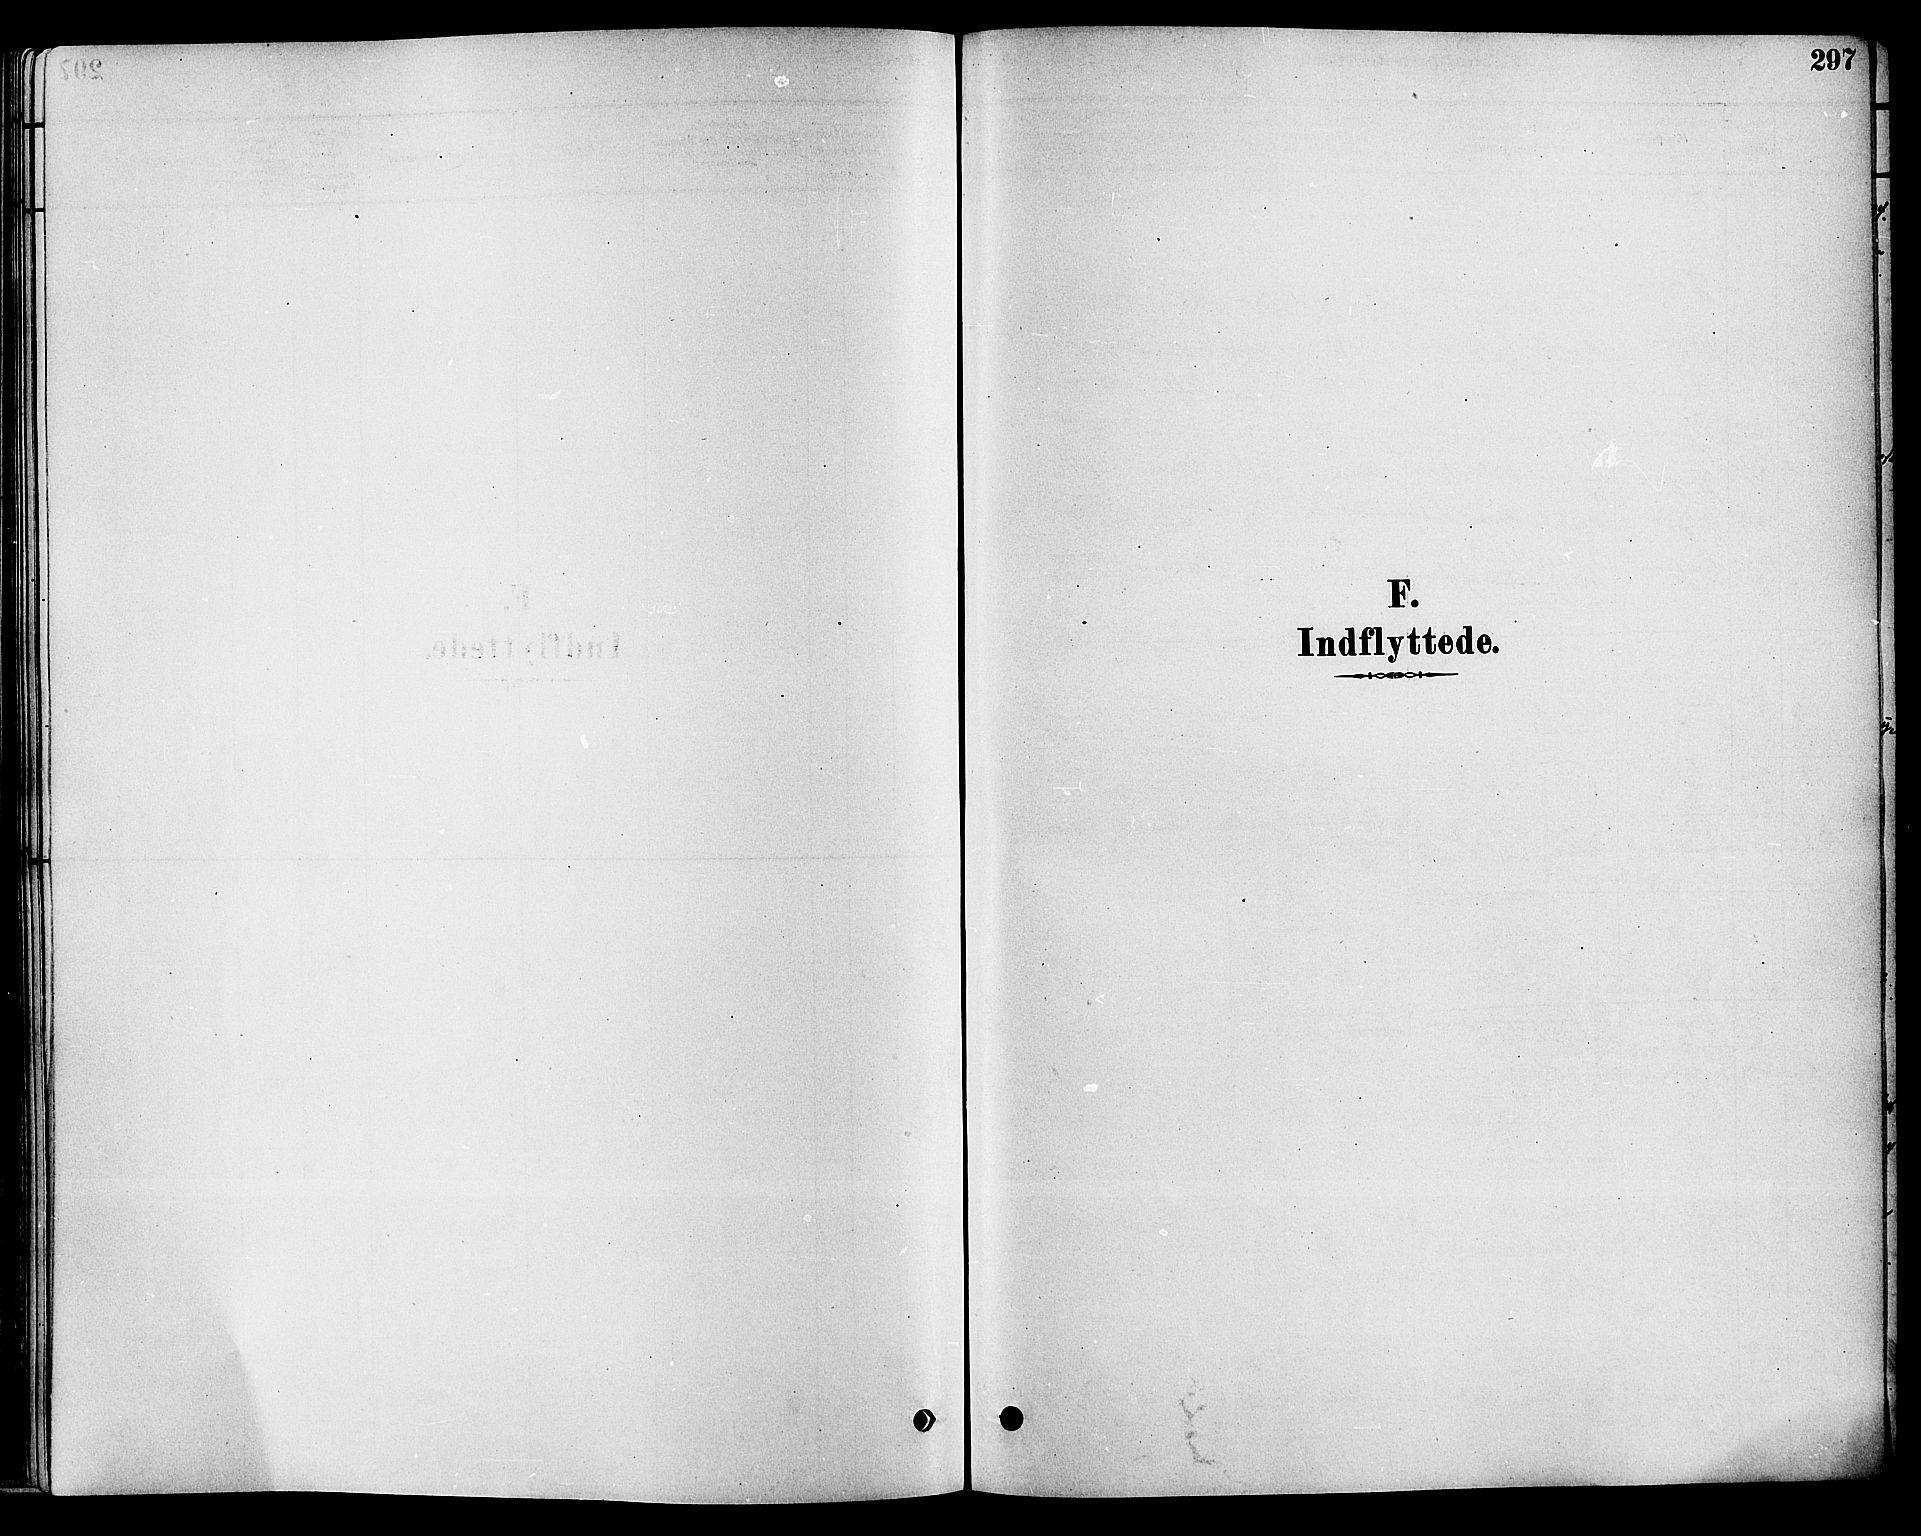 SAKO, Solum kirkebøker, F/Fa/L0009: Ministerialbok nr. I 9, 1877-1887, s. 297